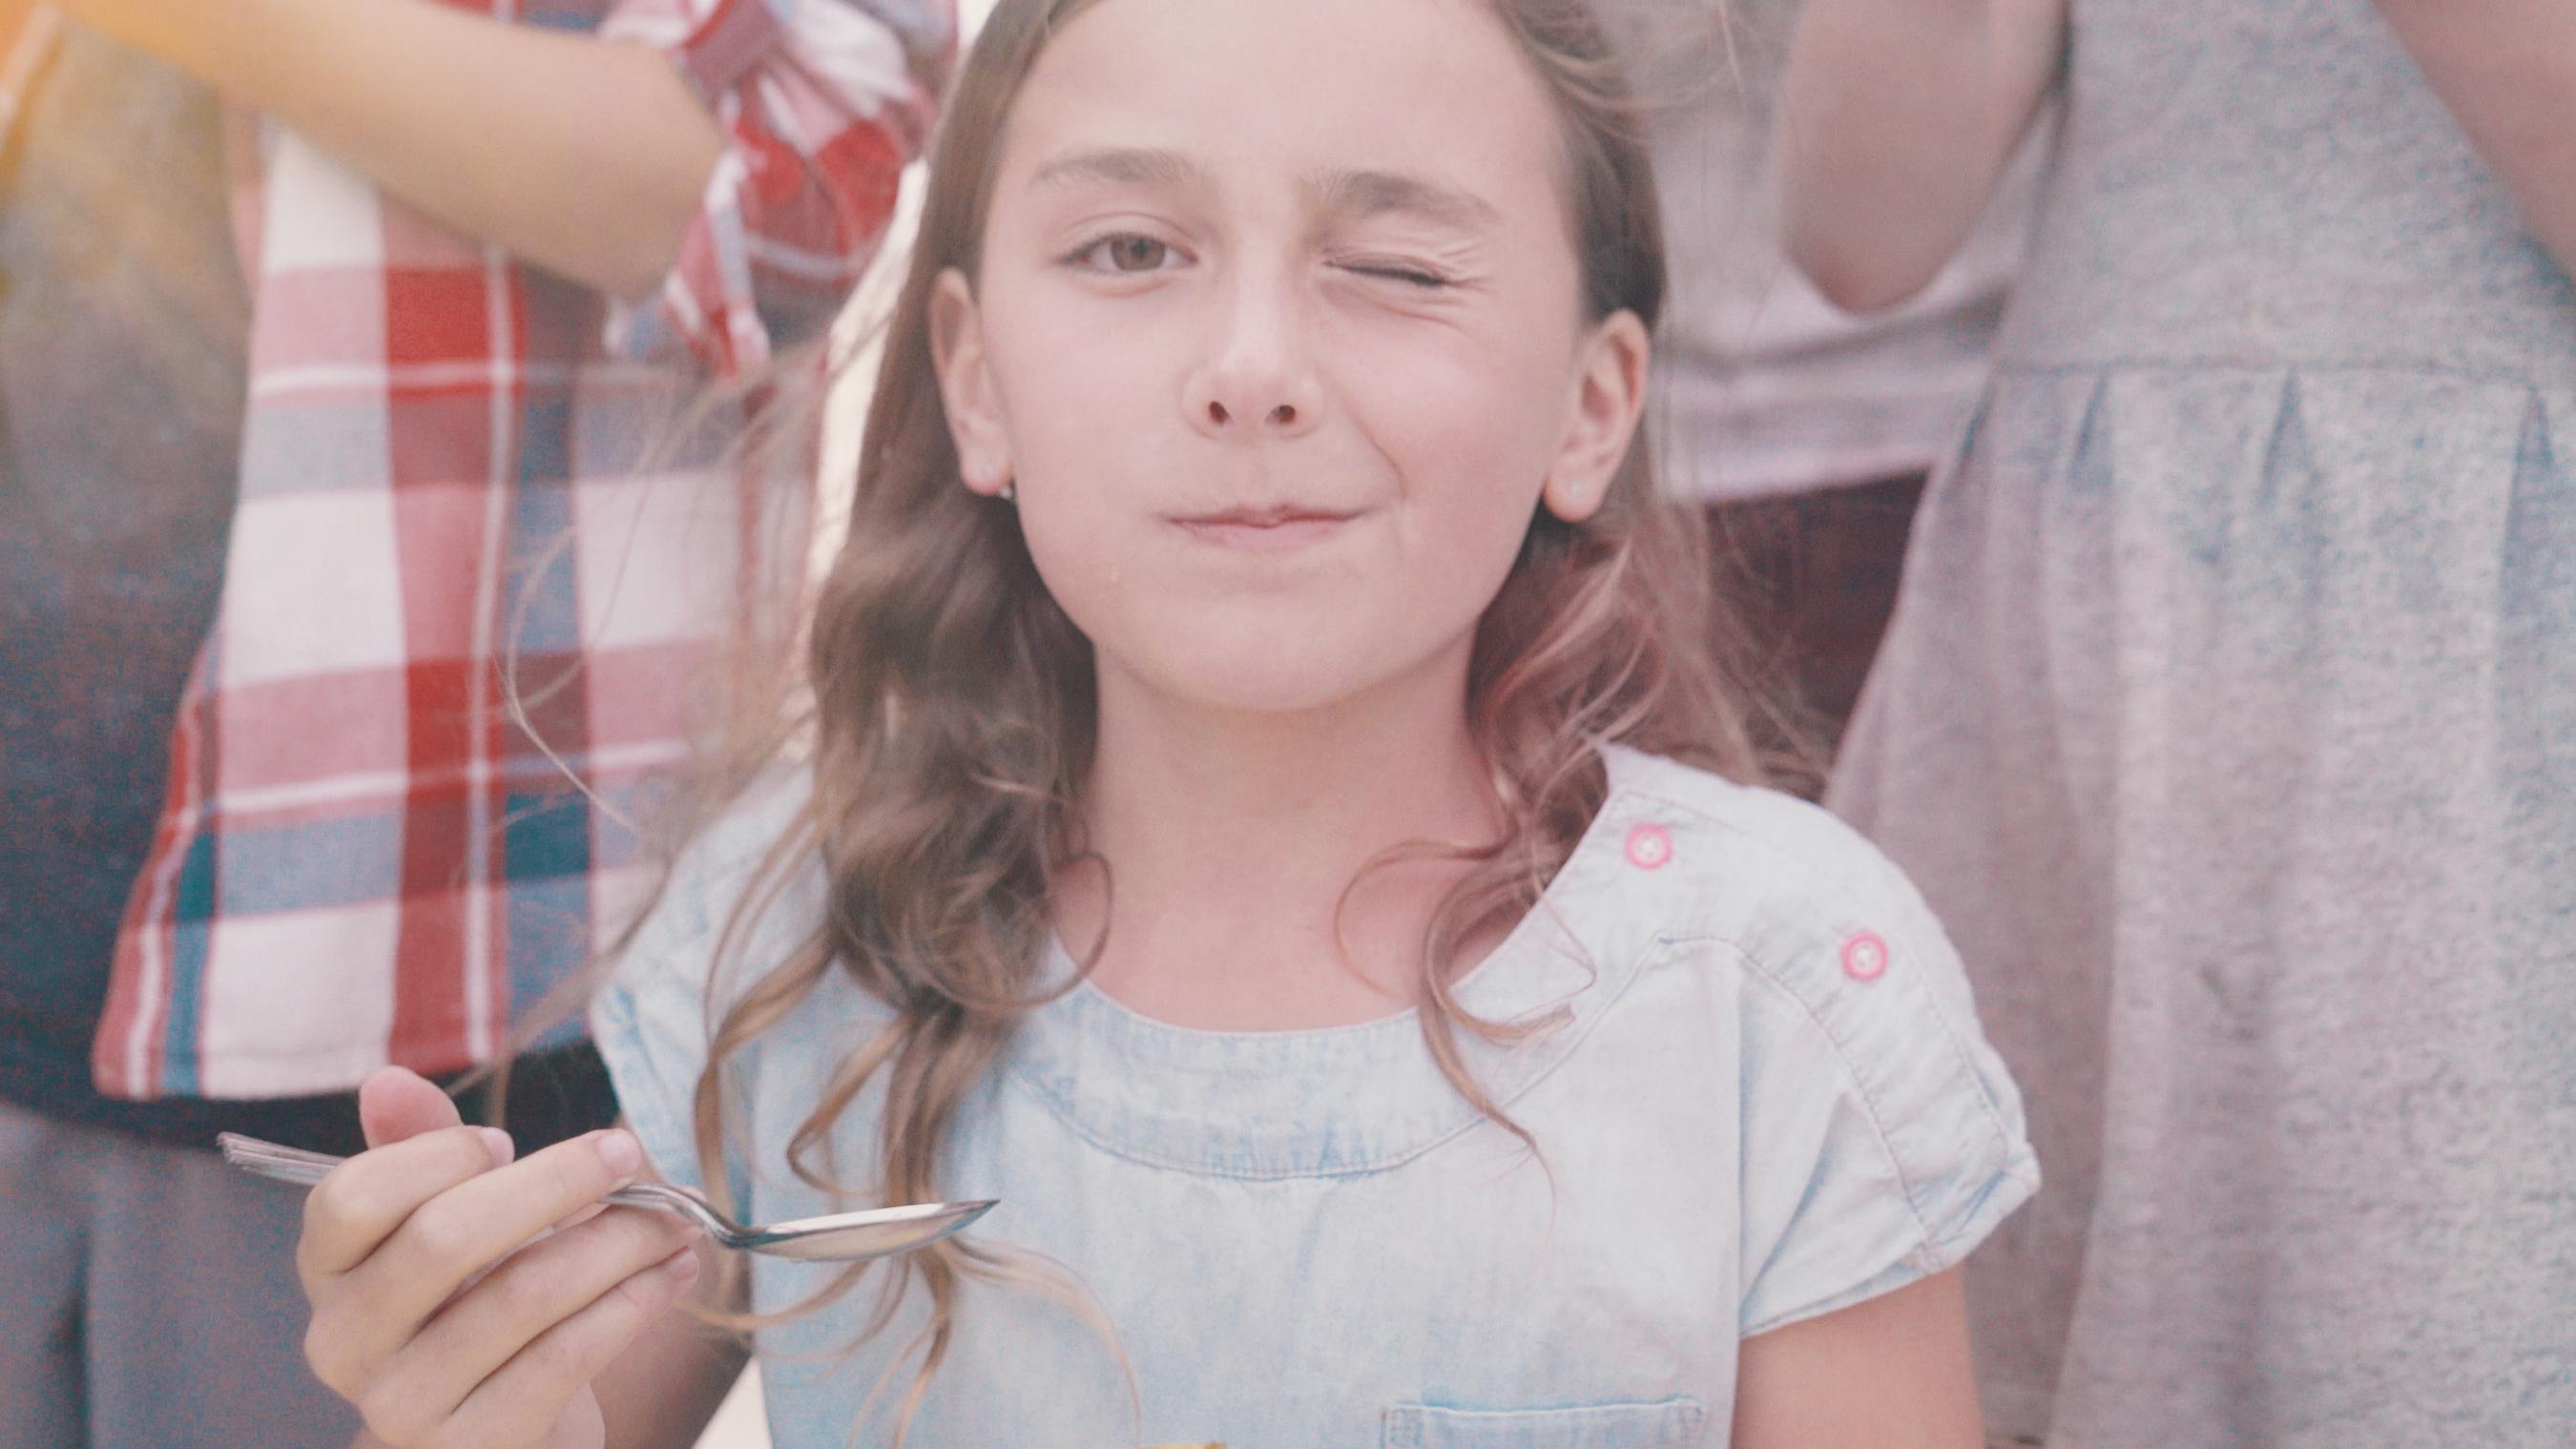 Zespri Kiwifruit is kicking-off summer and the seasonal return of SunGold Kiwis with an original video that brings to life the joyful spirit of summer and the unique taste of Zespri SunGold Kiwifruit.